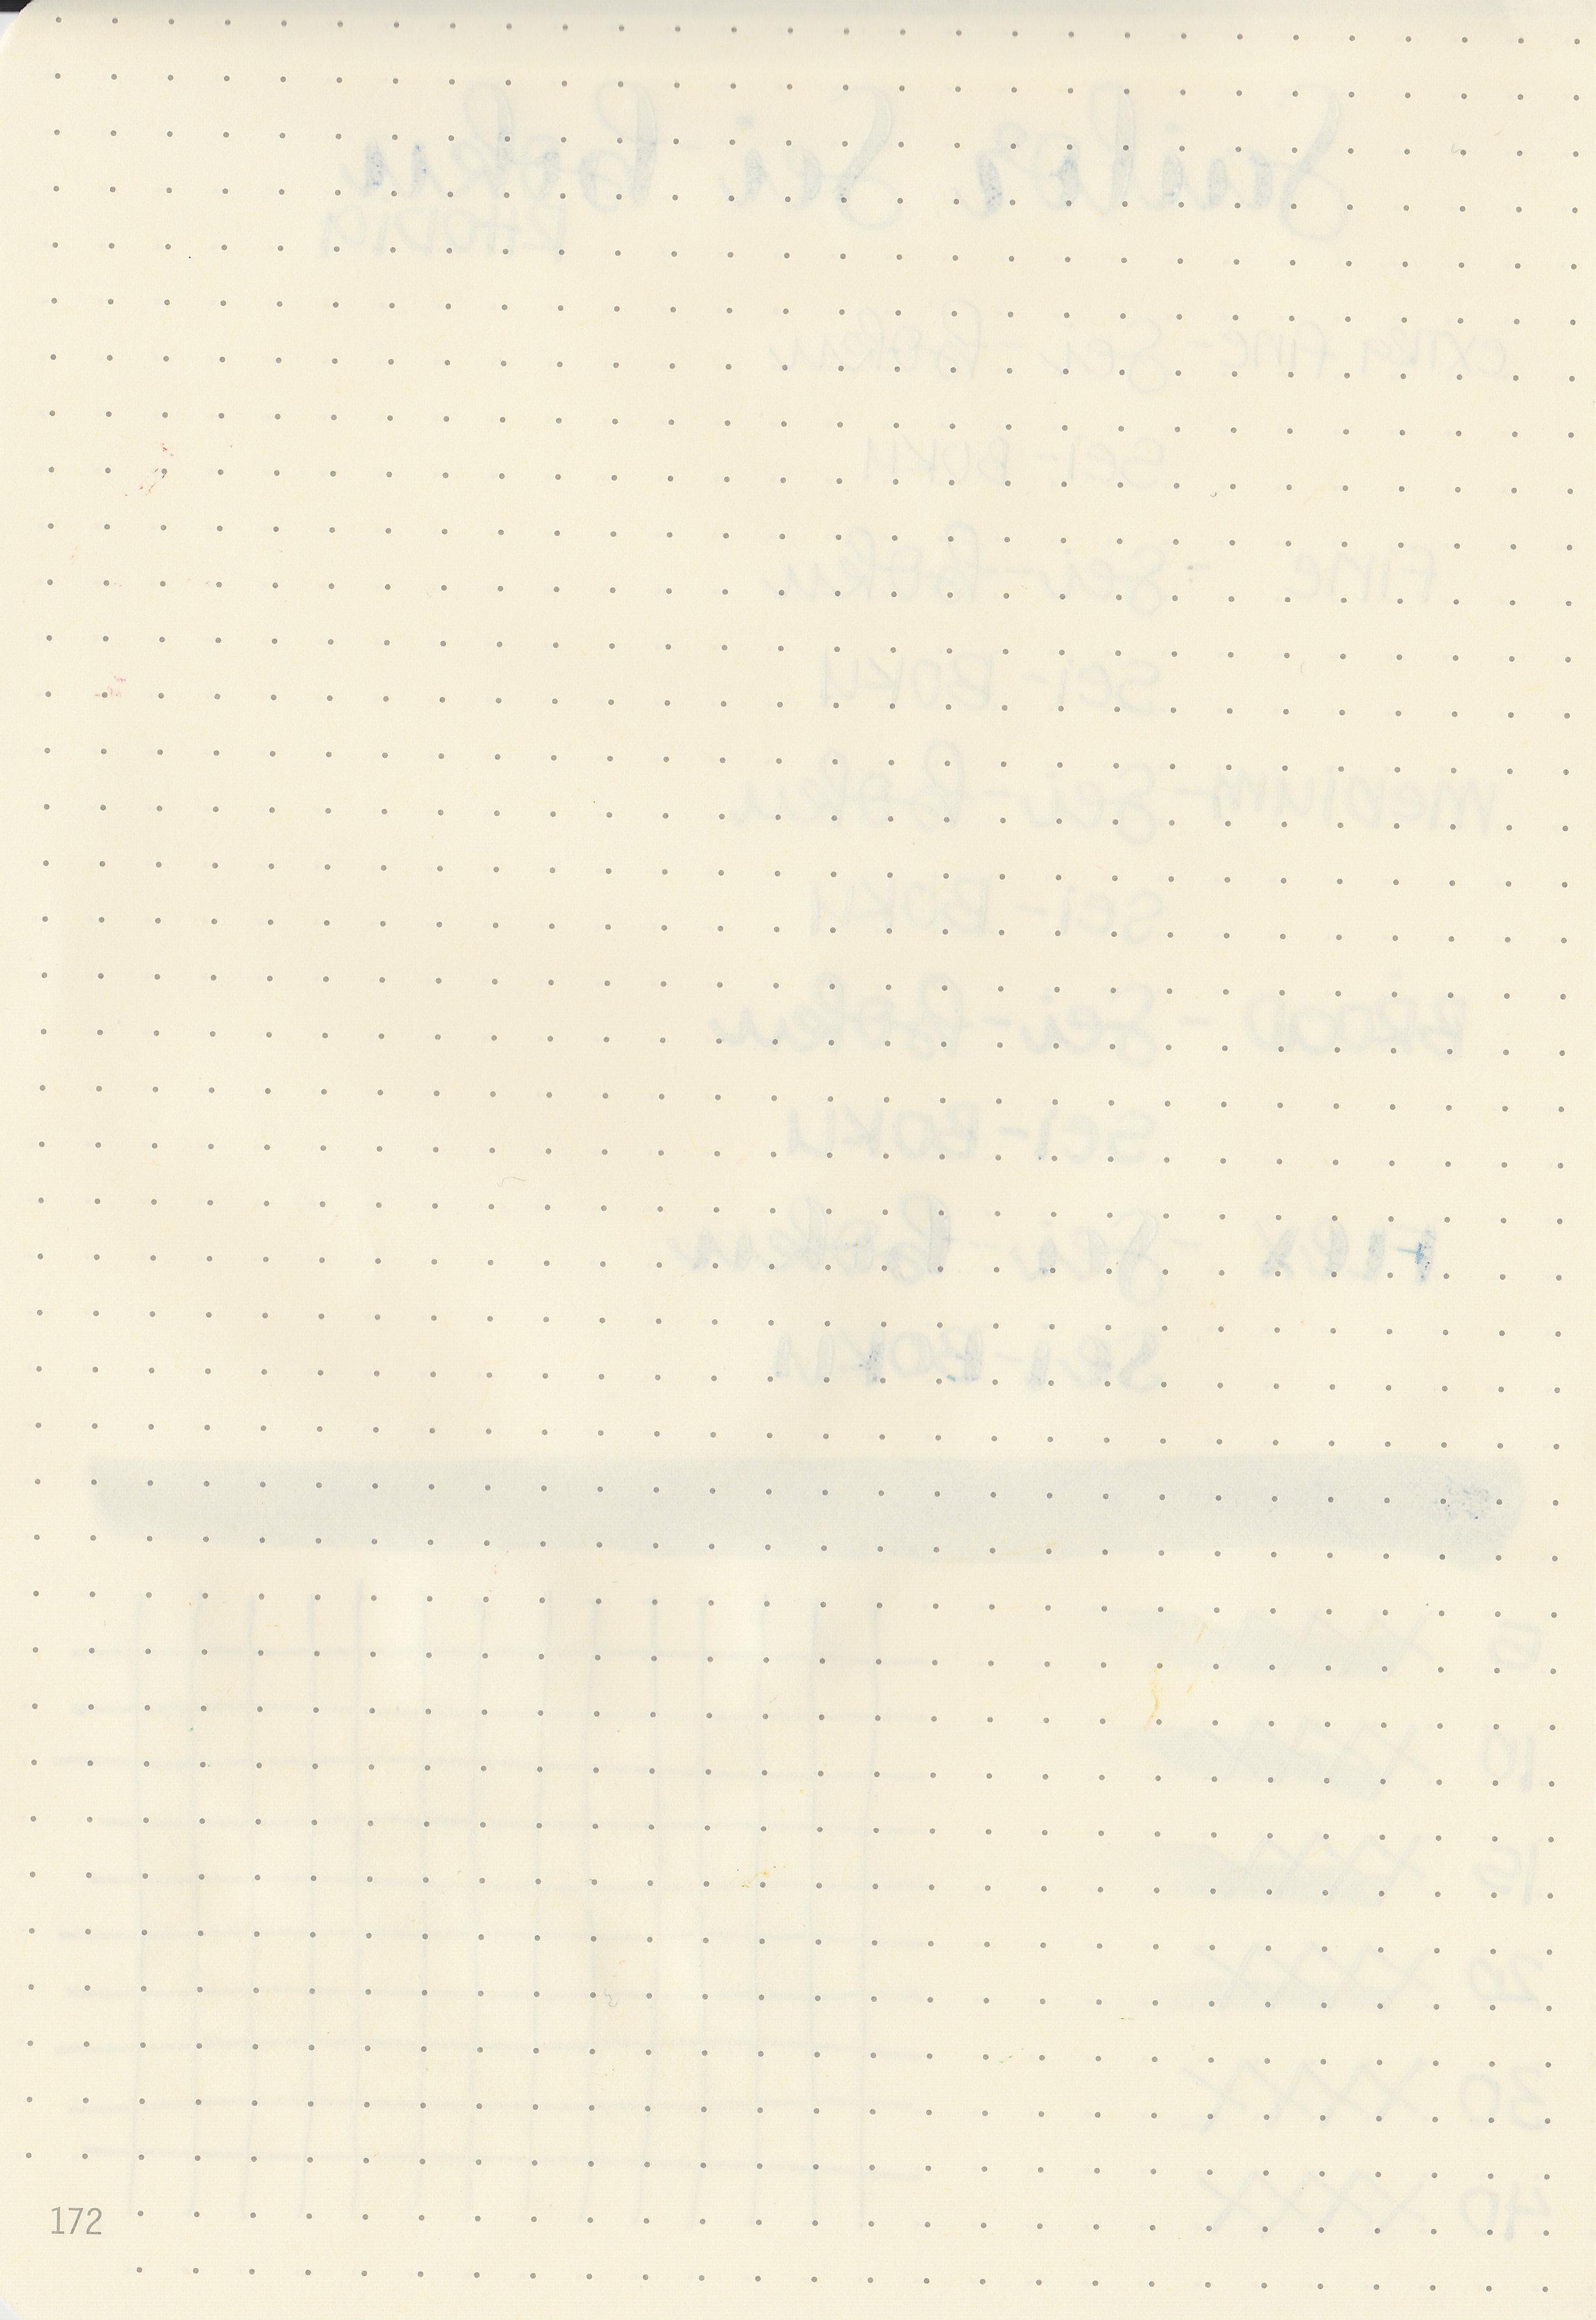 sj-sei-boku-10.jpg